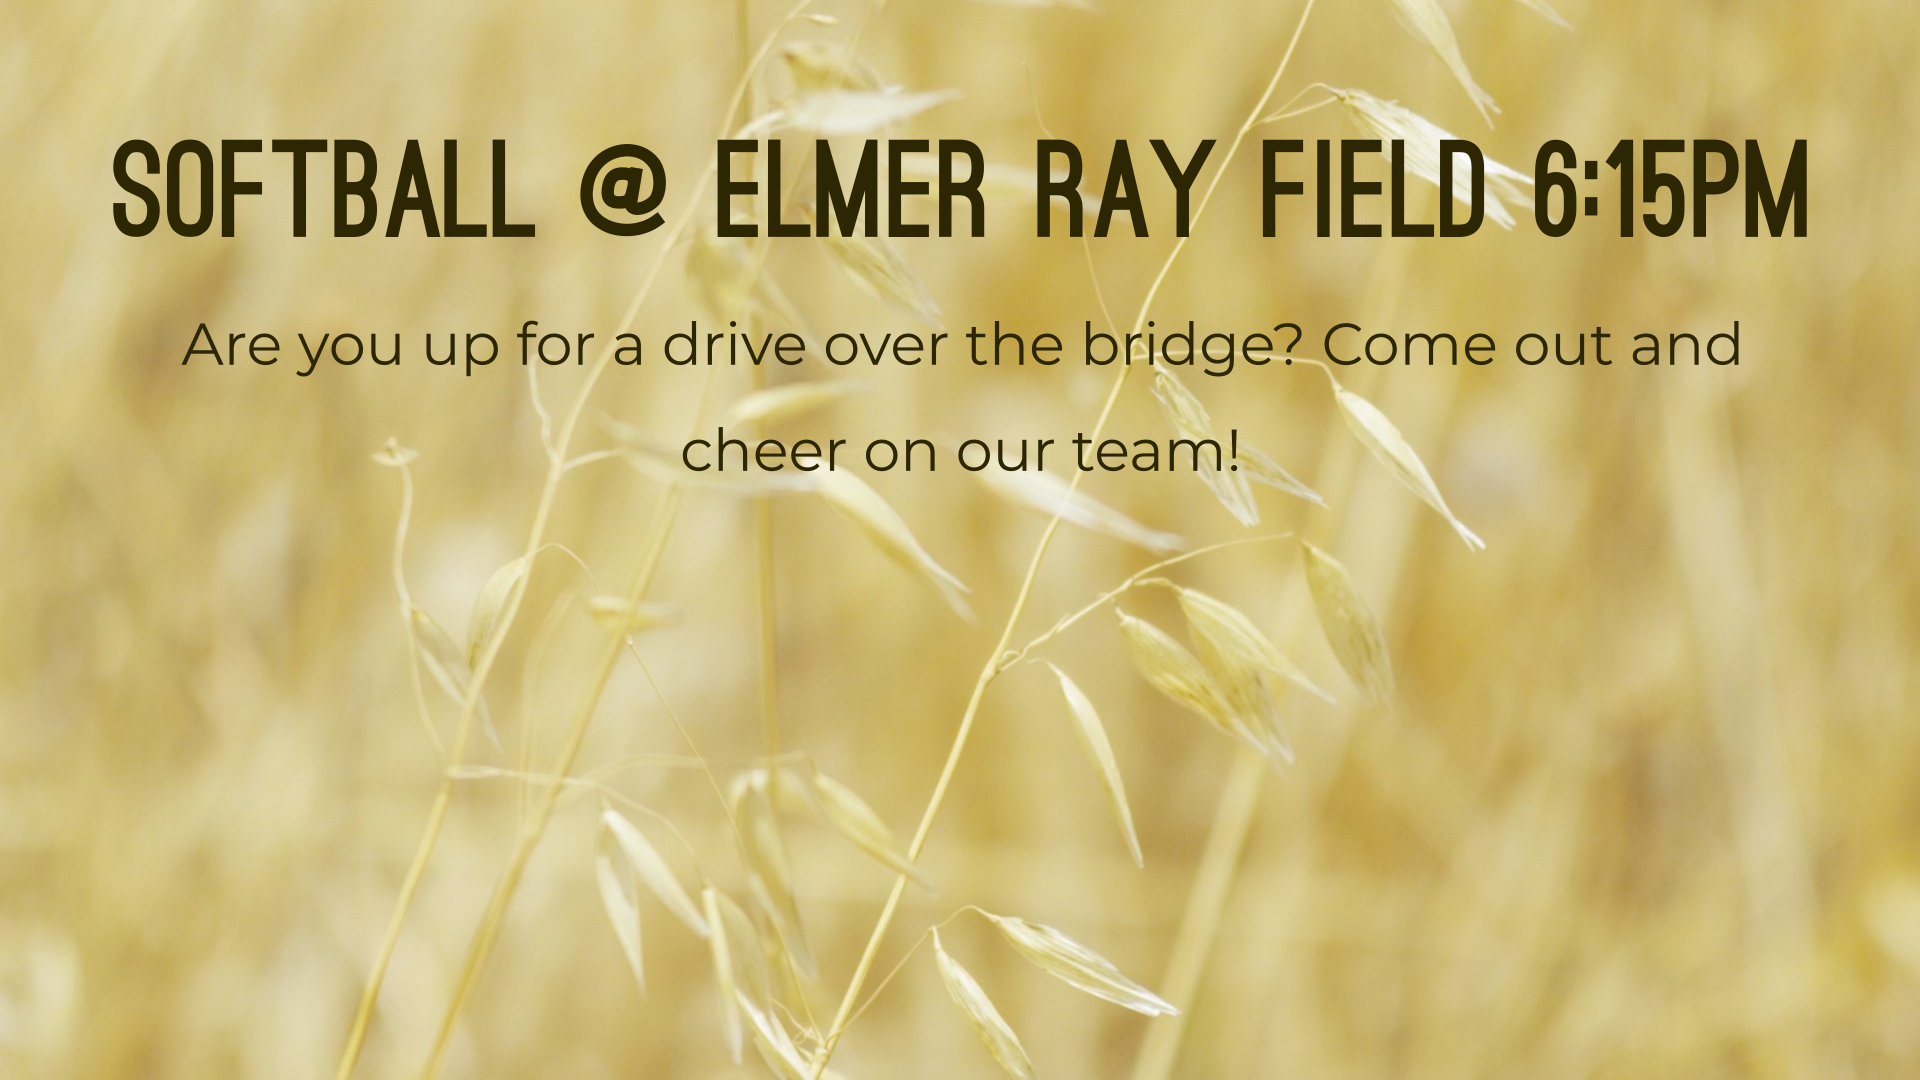 Softball @ Elmer Ray Field 6:15pm